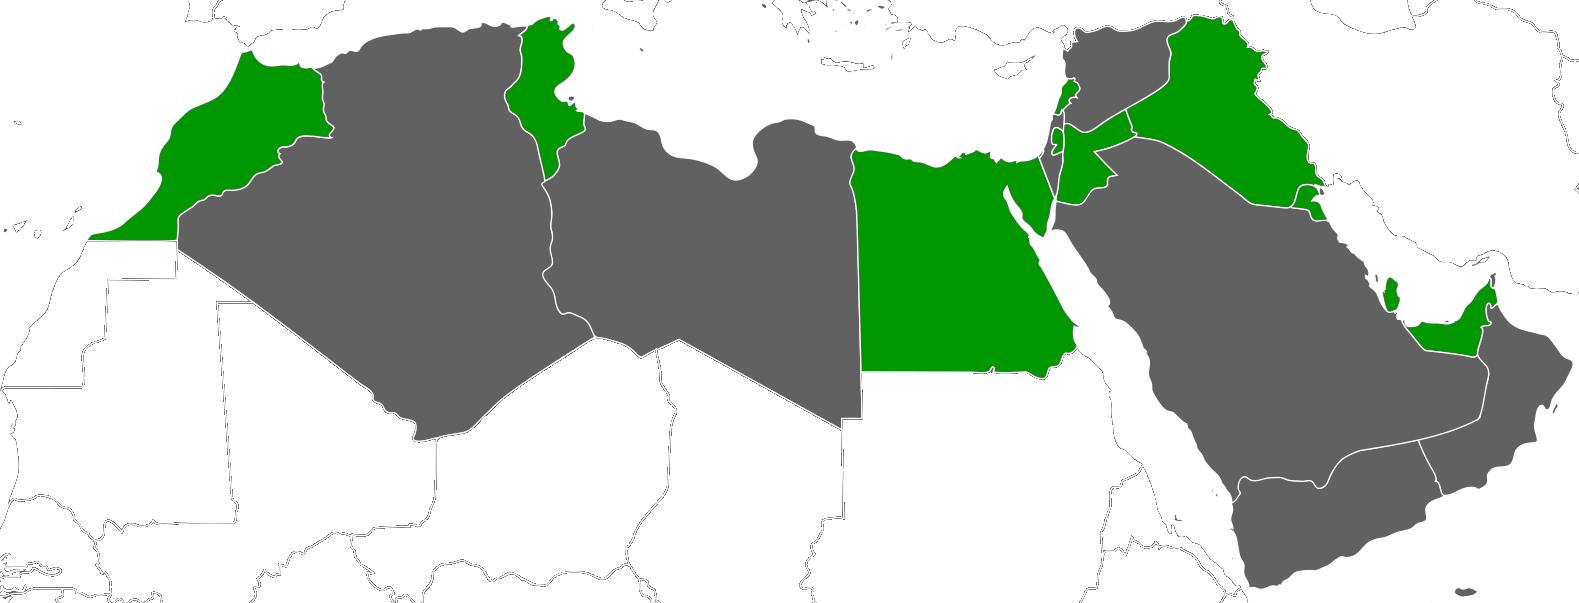 MENA alumni countries - blank